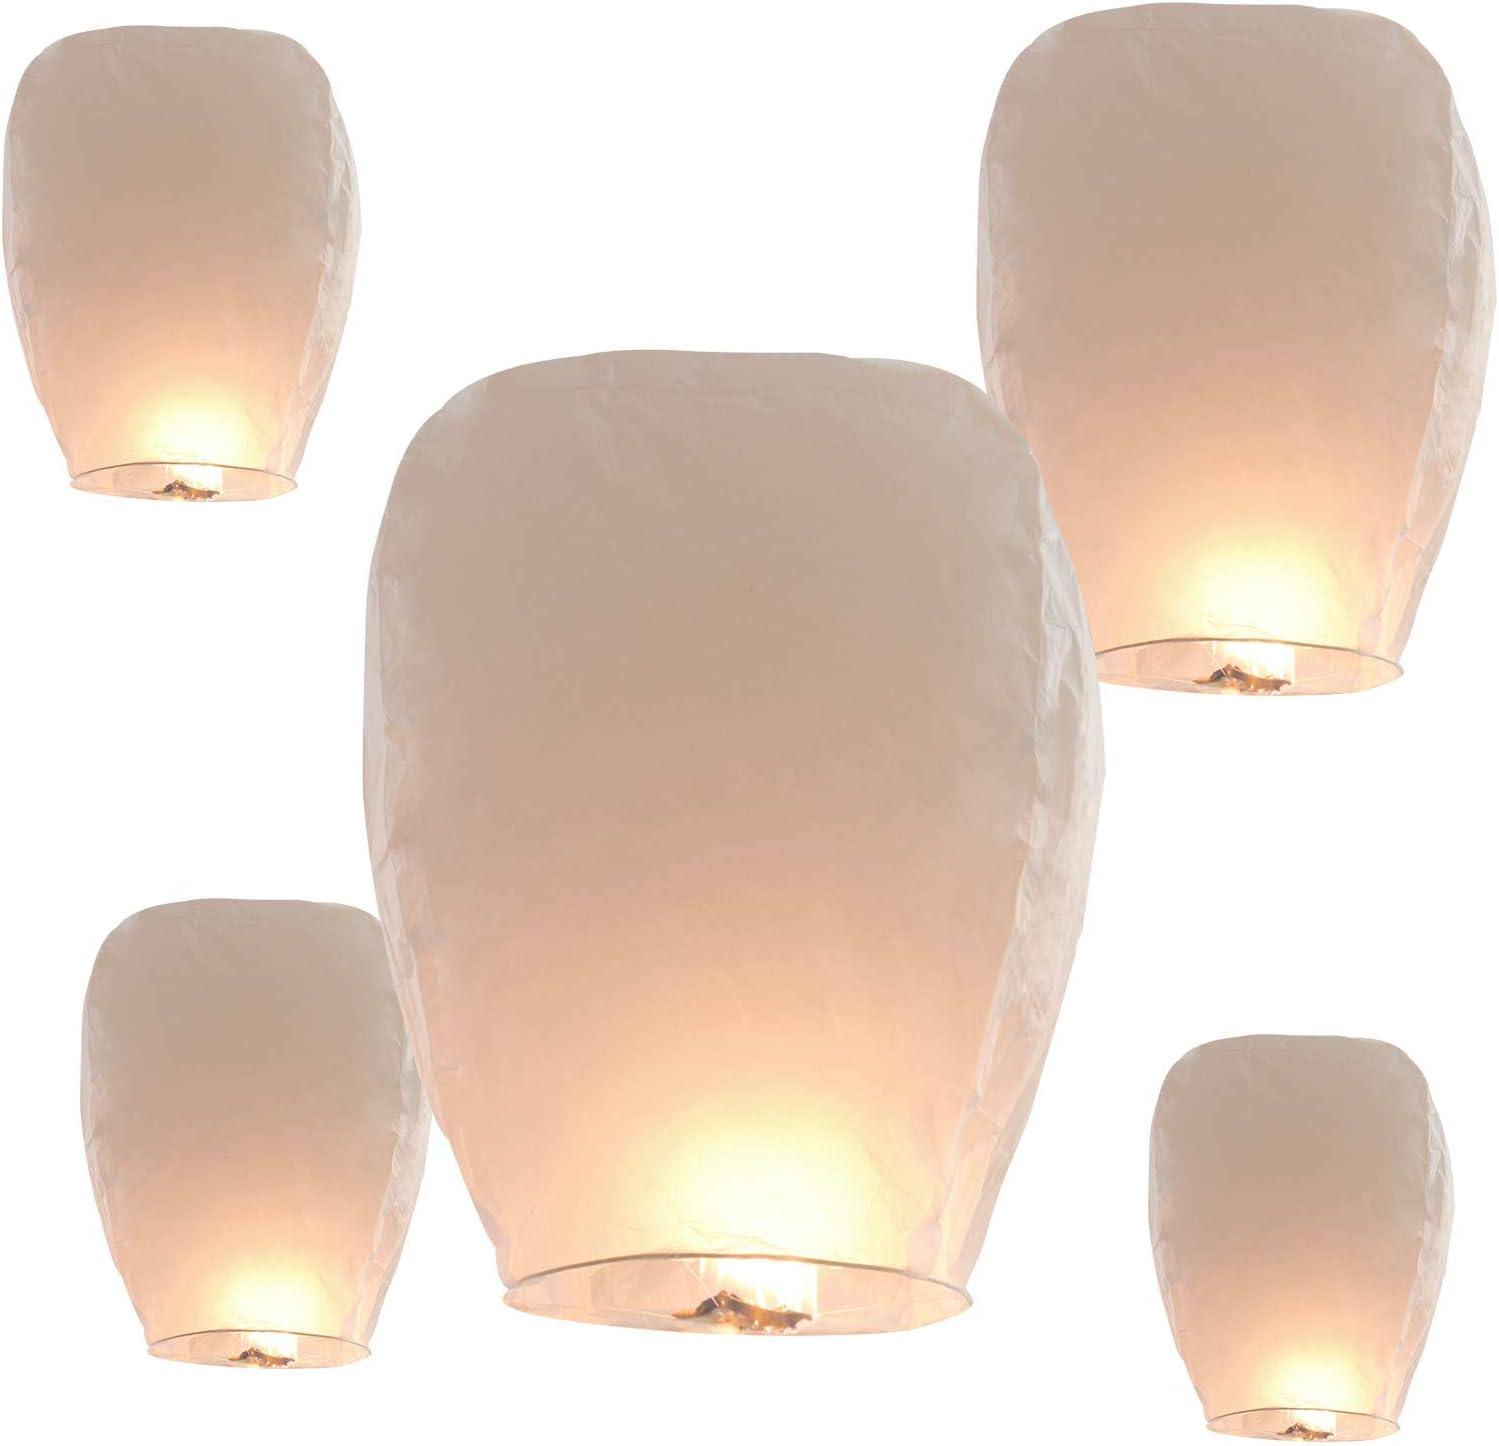 ILLUMINEW Sky Lanterns, Wishing Lanterns Biodegradable Paper Chinese Lanterns for Party, Birthday, New Years, Wedding Decorations (White-5)